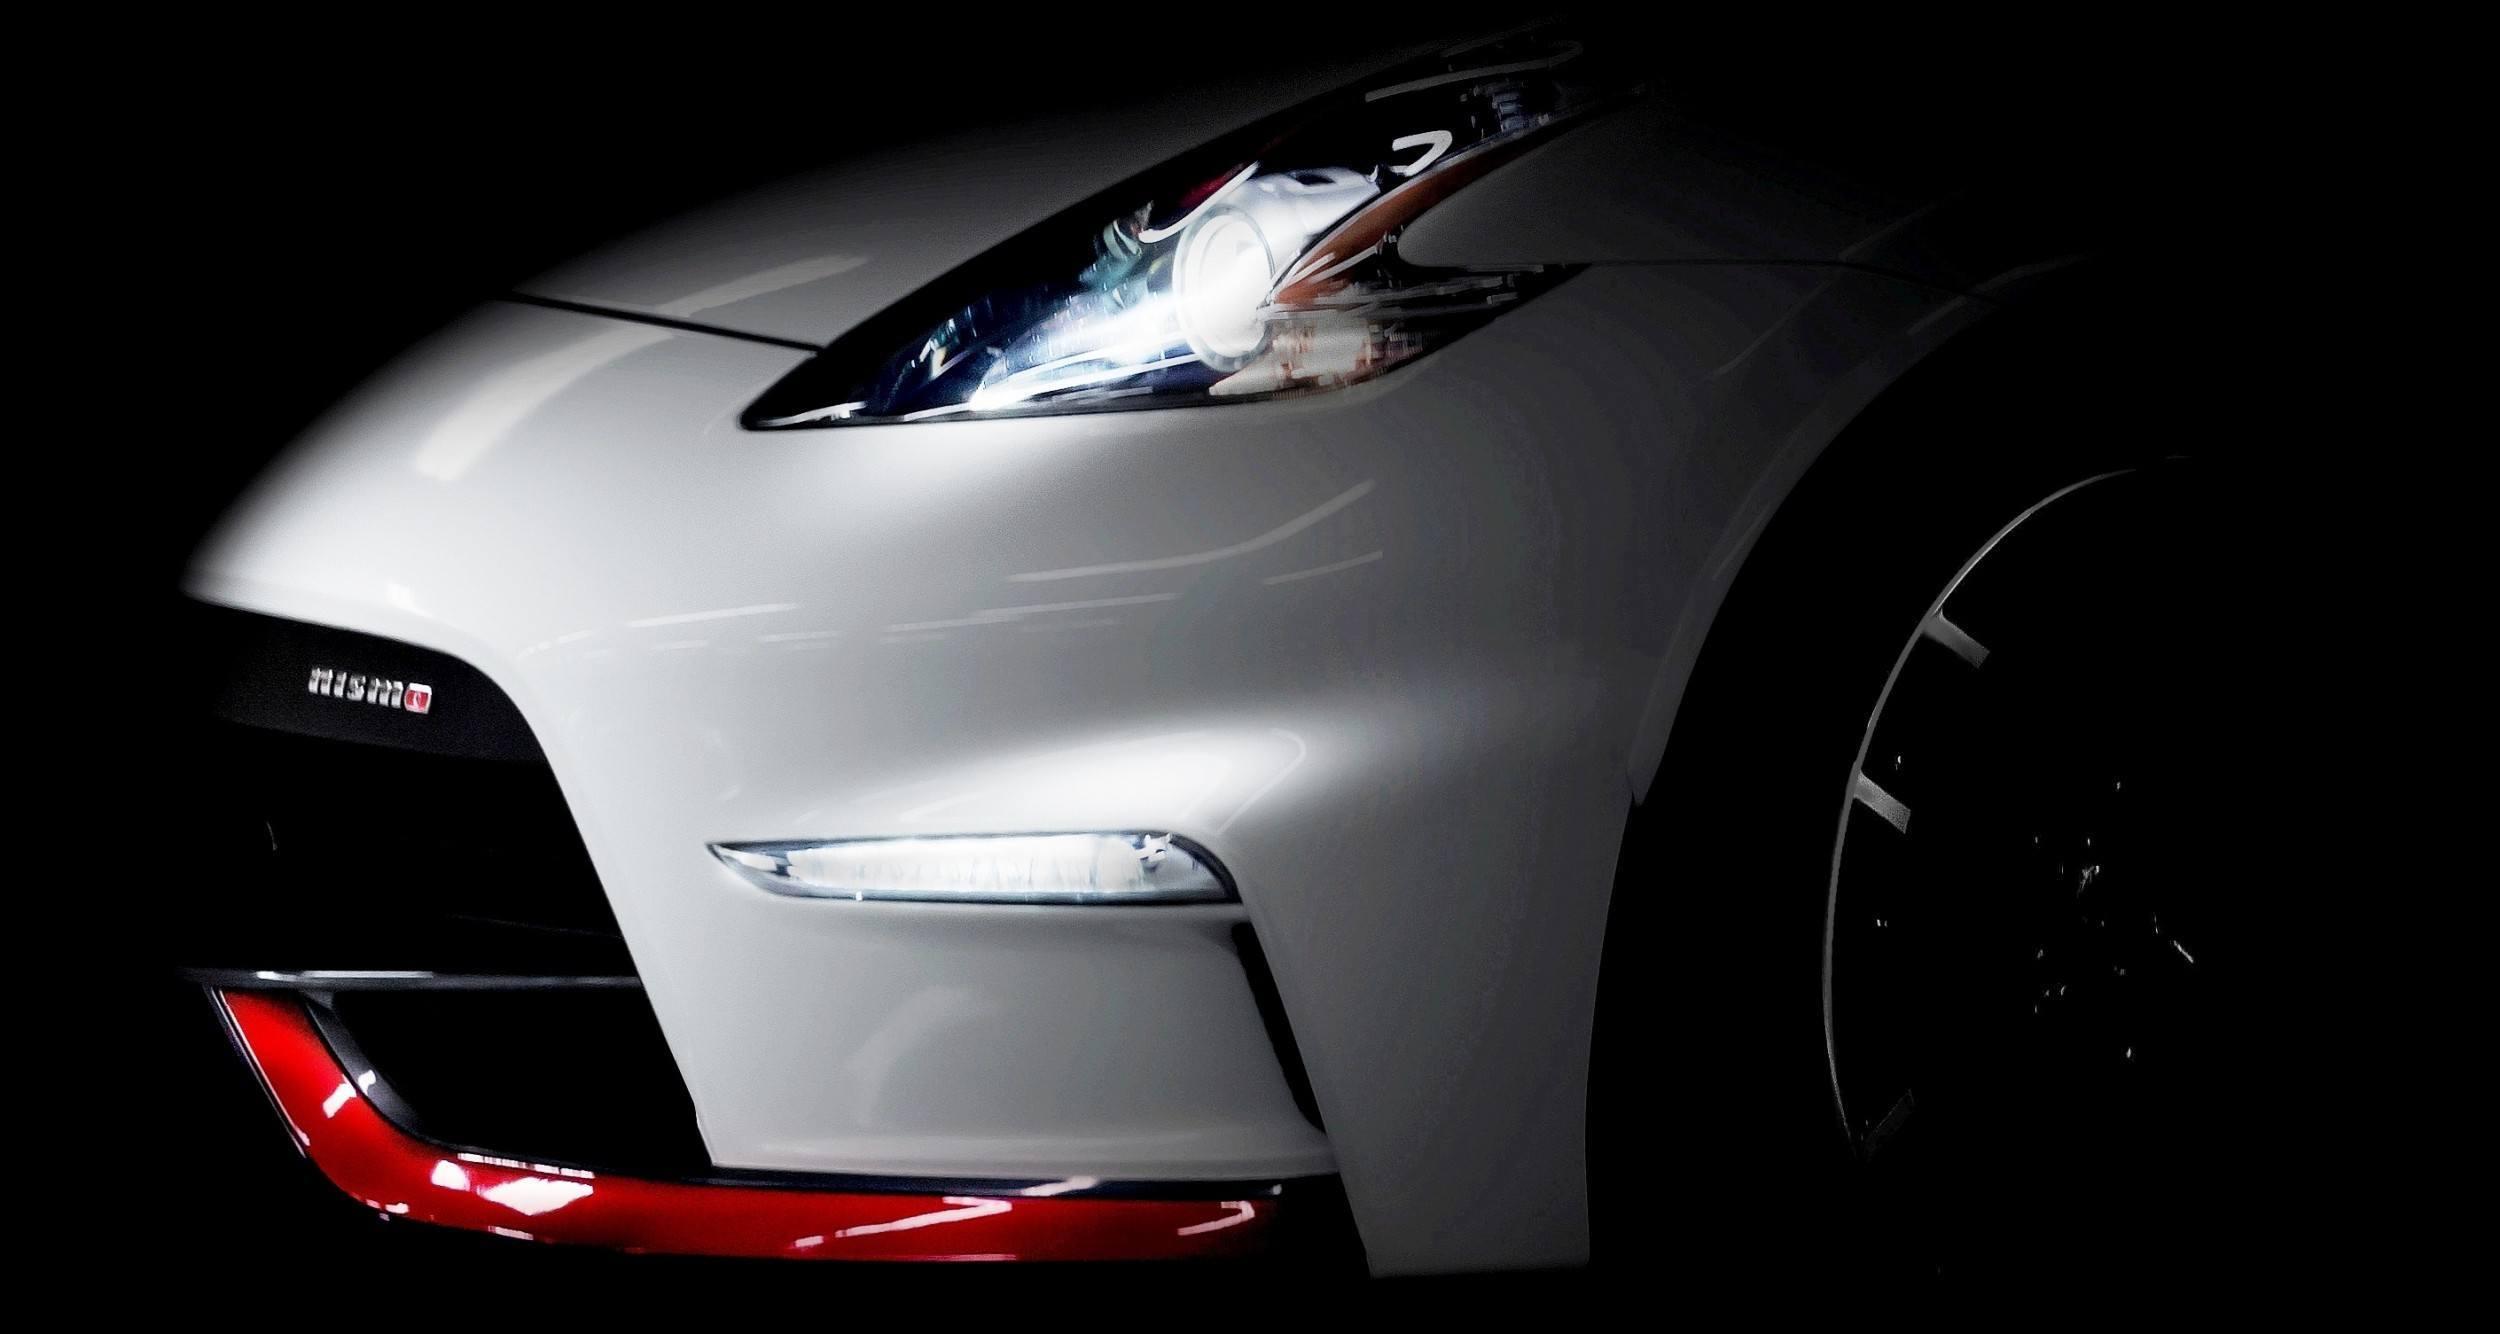 2015 Nissan 370z Nismo Facelift